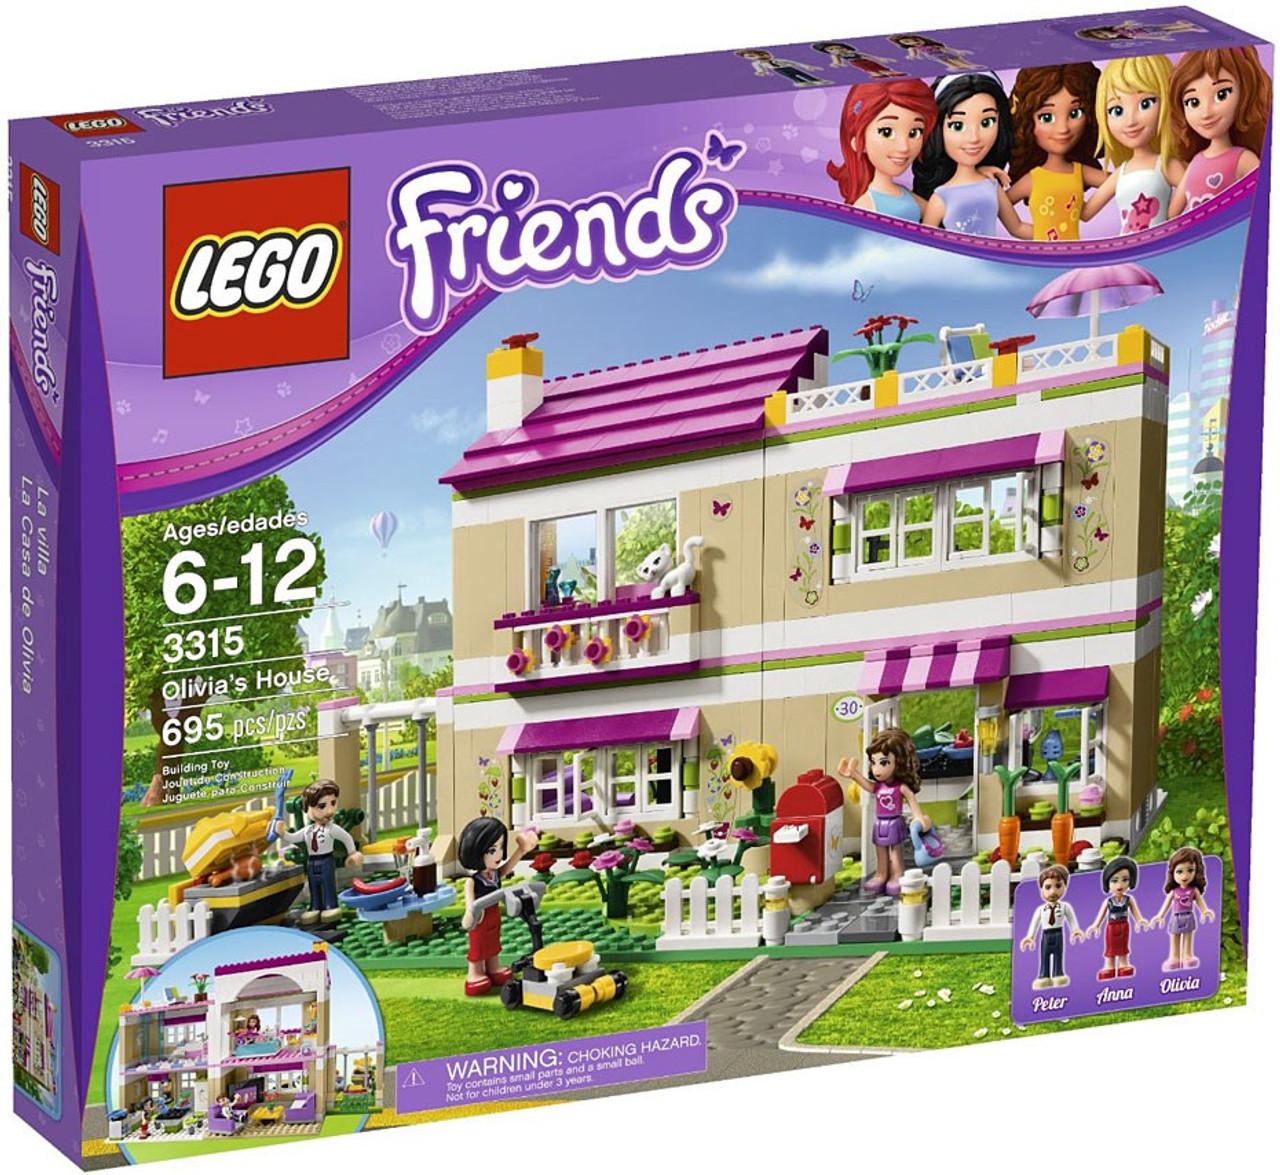 LEGO Friends Olivia's House Set #3315